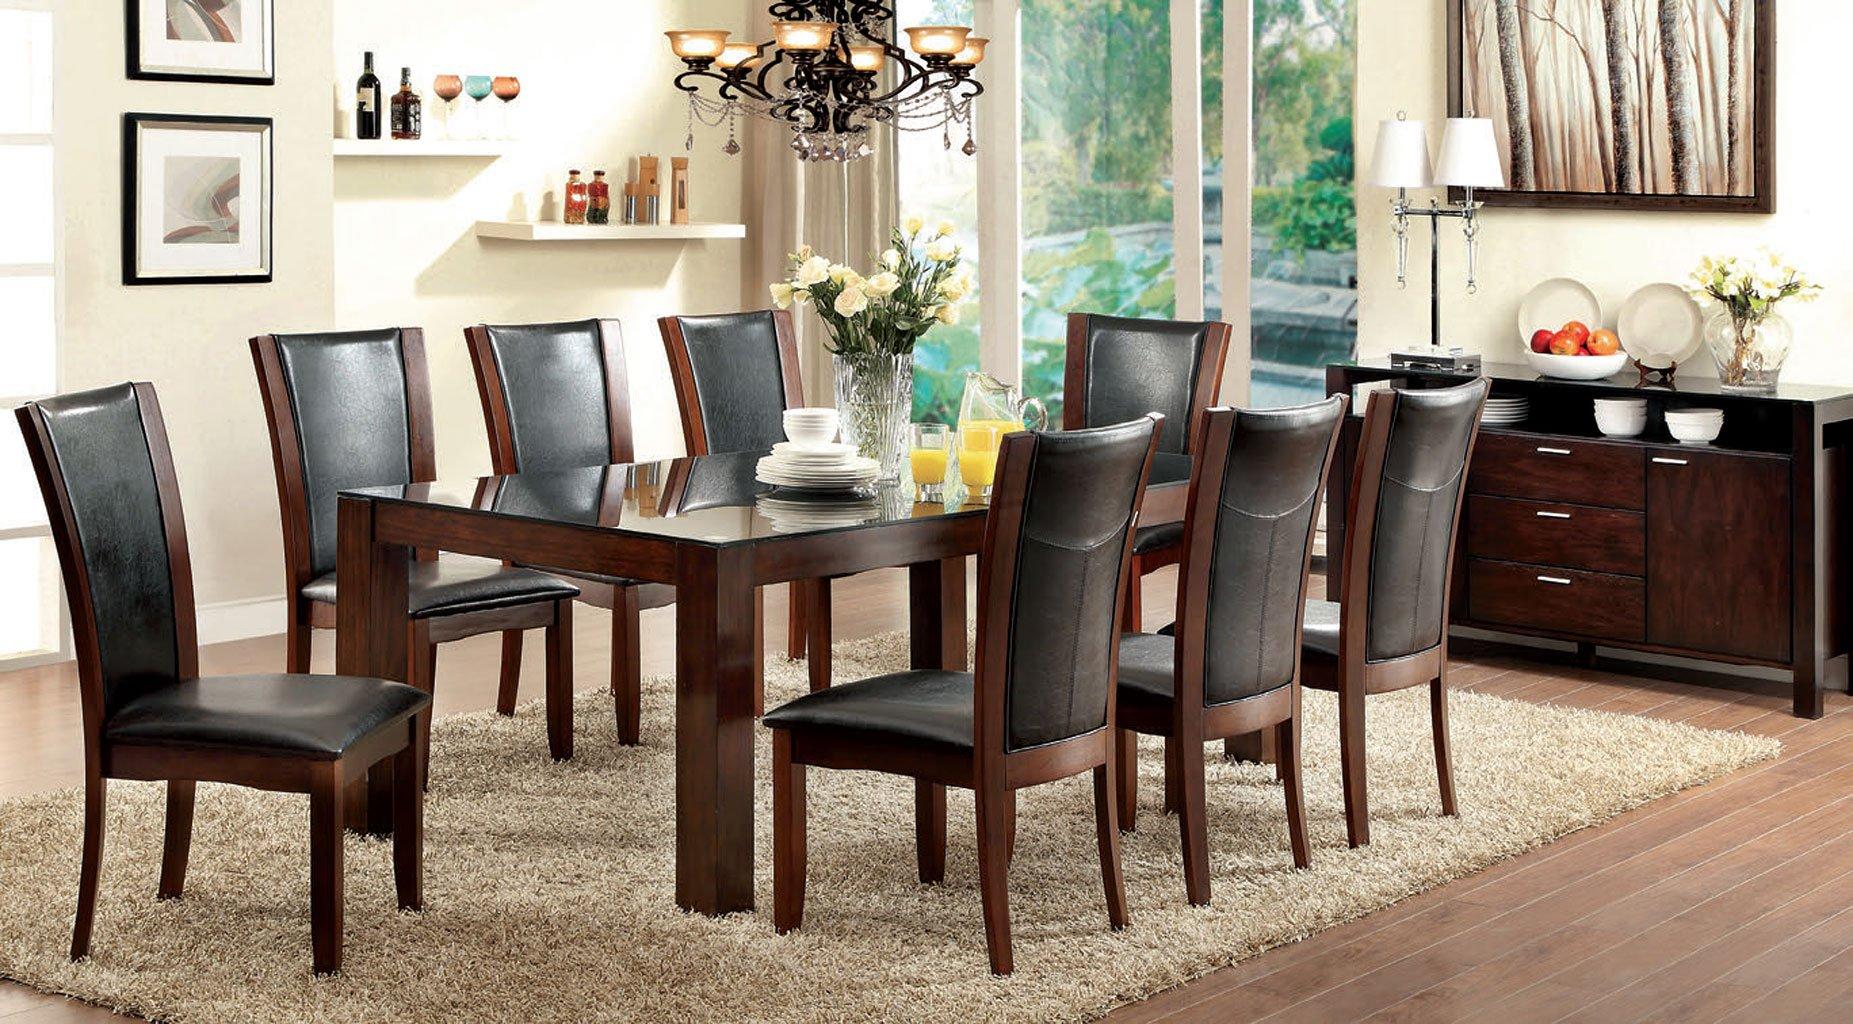 Astoria I Dining Room Set W/ Manhattan Chairs (Black)